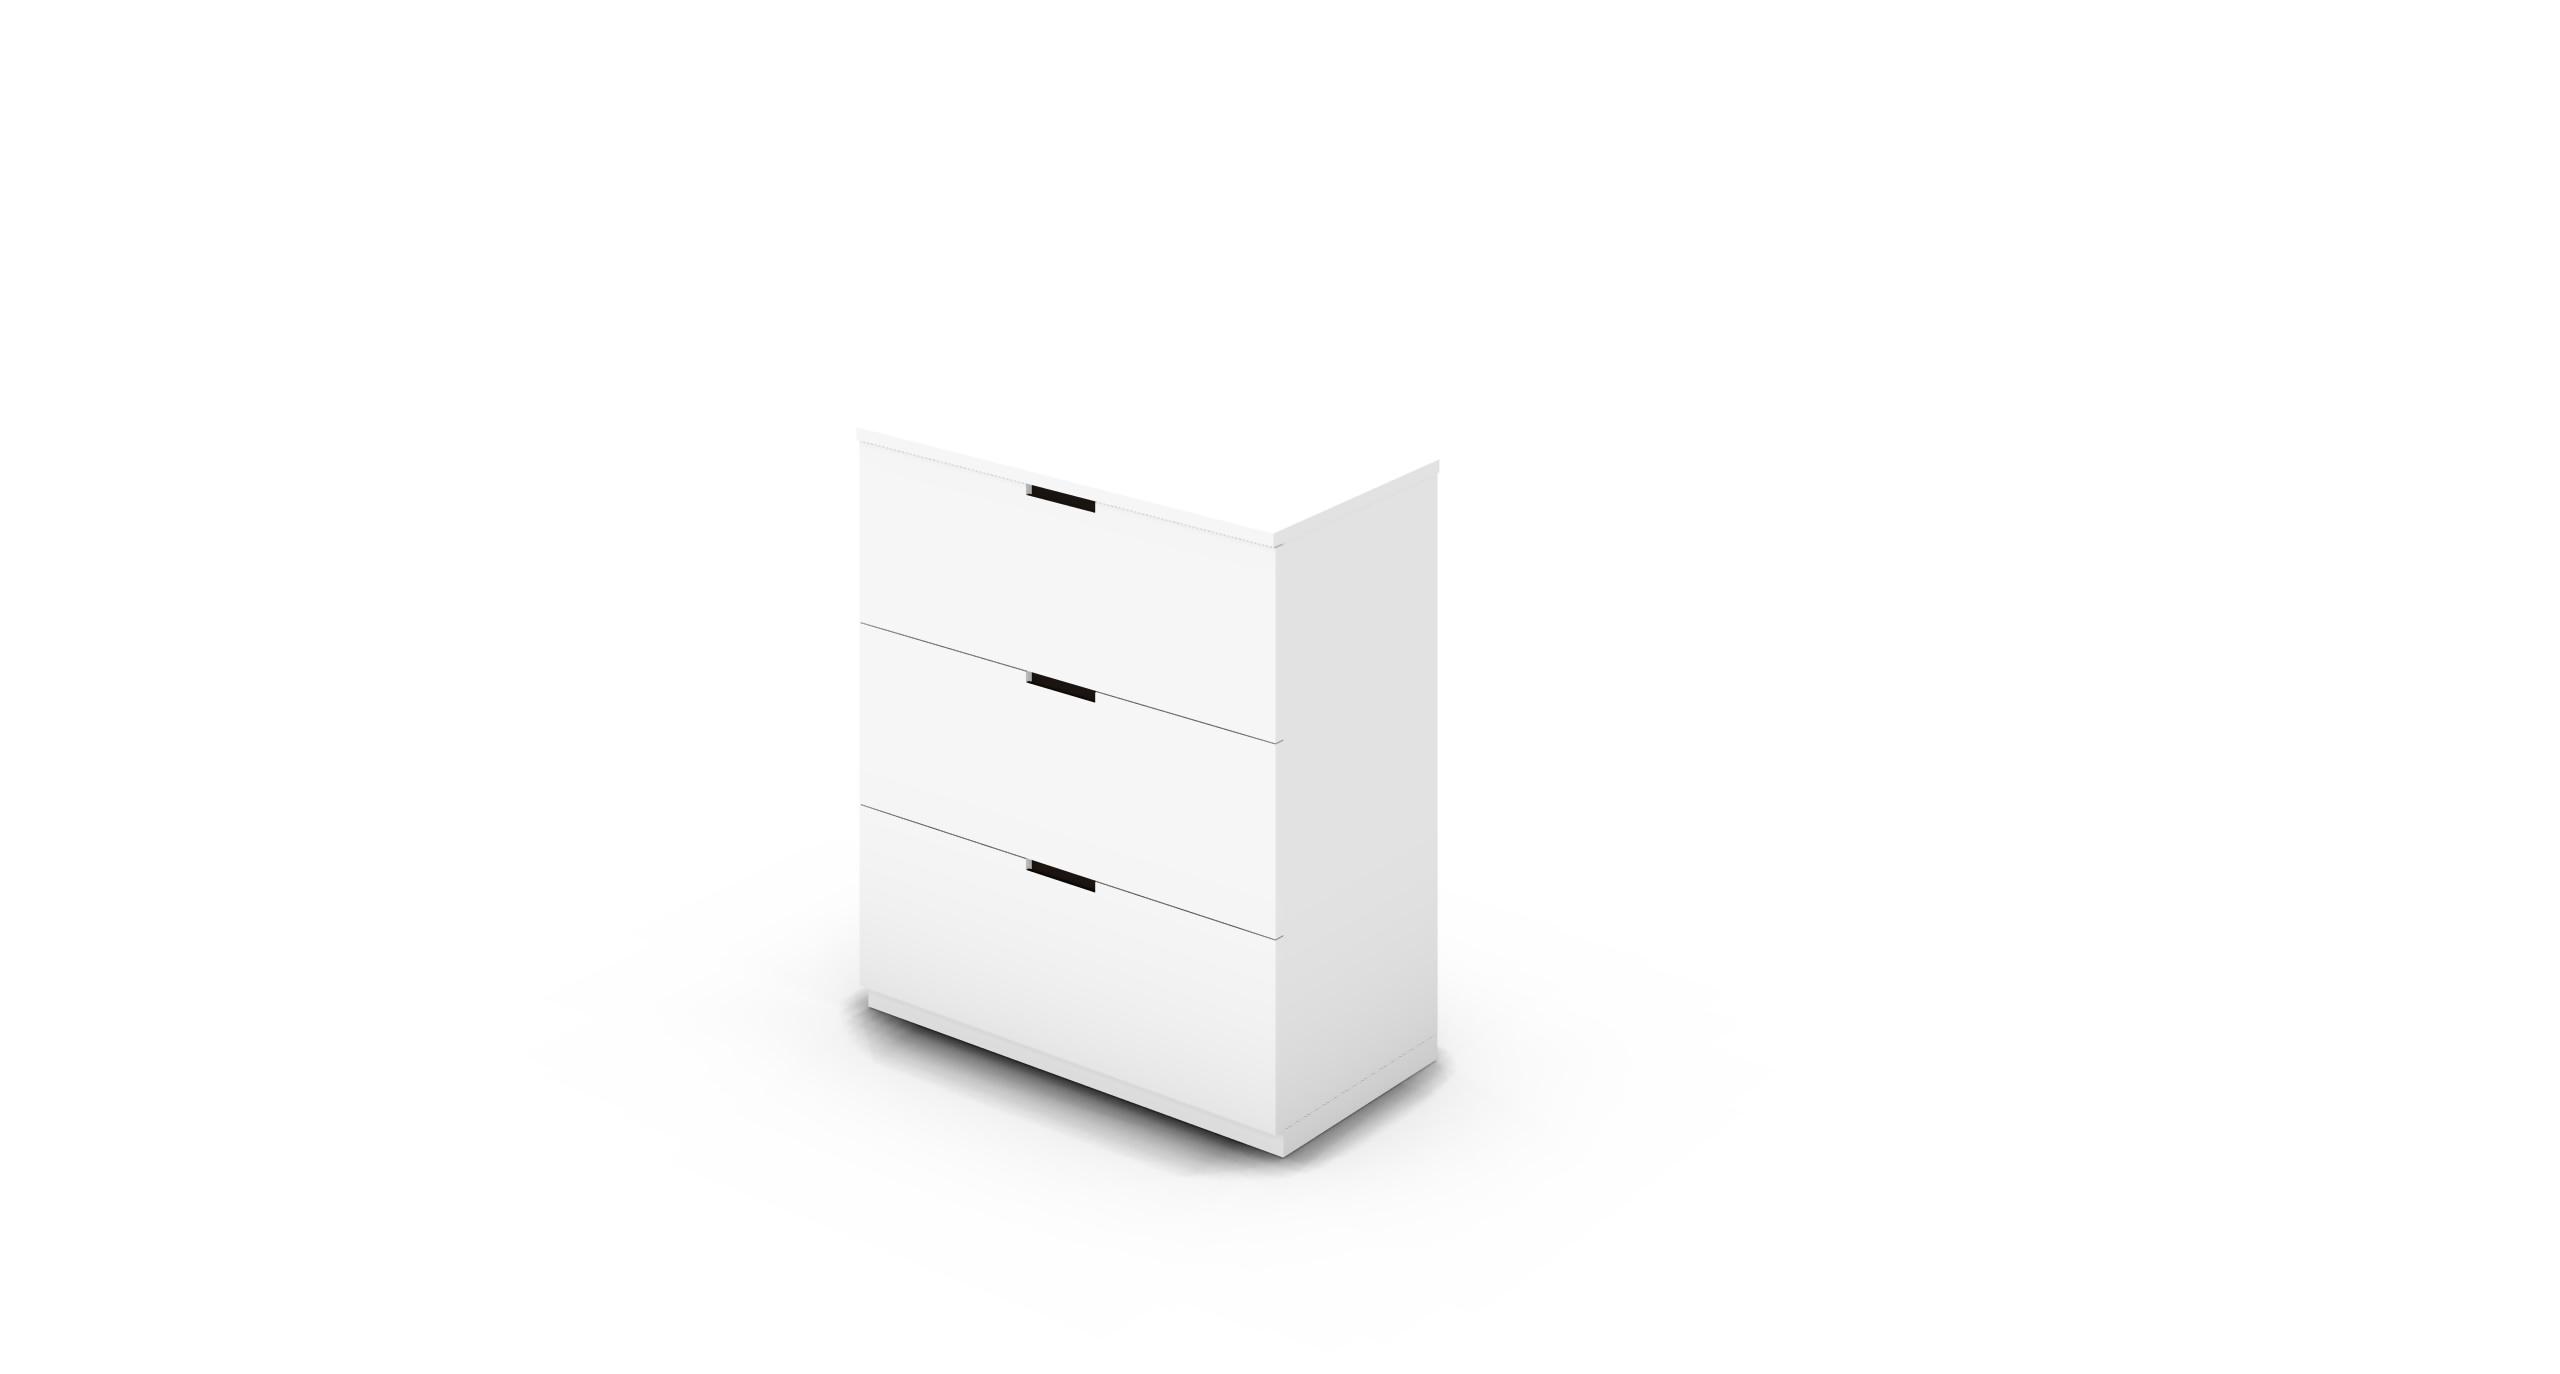 Cabinet_900x450x1125_DR_White_CutOut_NoCylinder